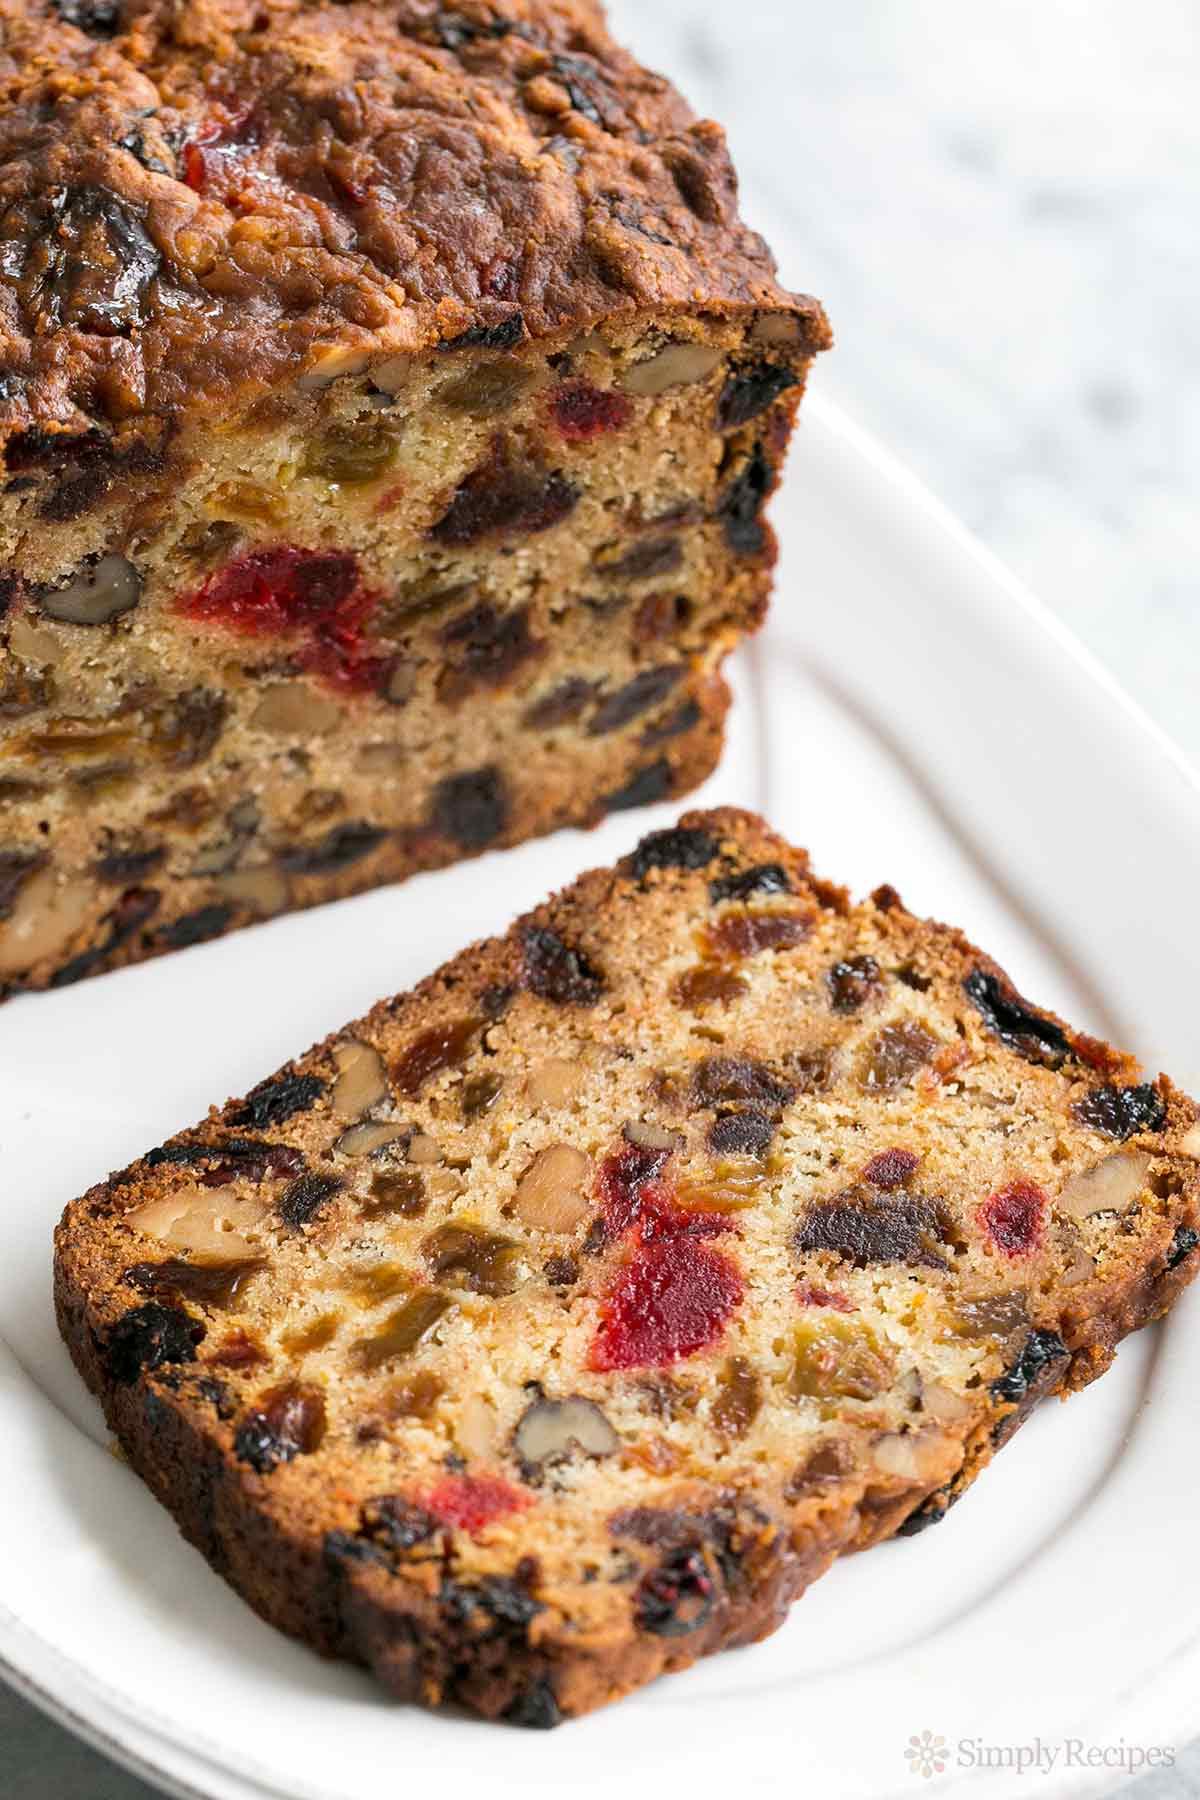 Fruit Cake Recipe  Our Favorite Holiday Fruitcake Recipe